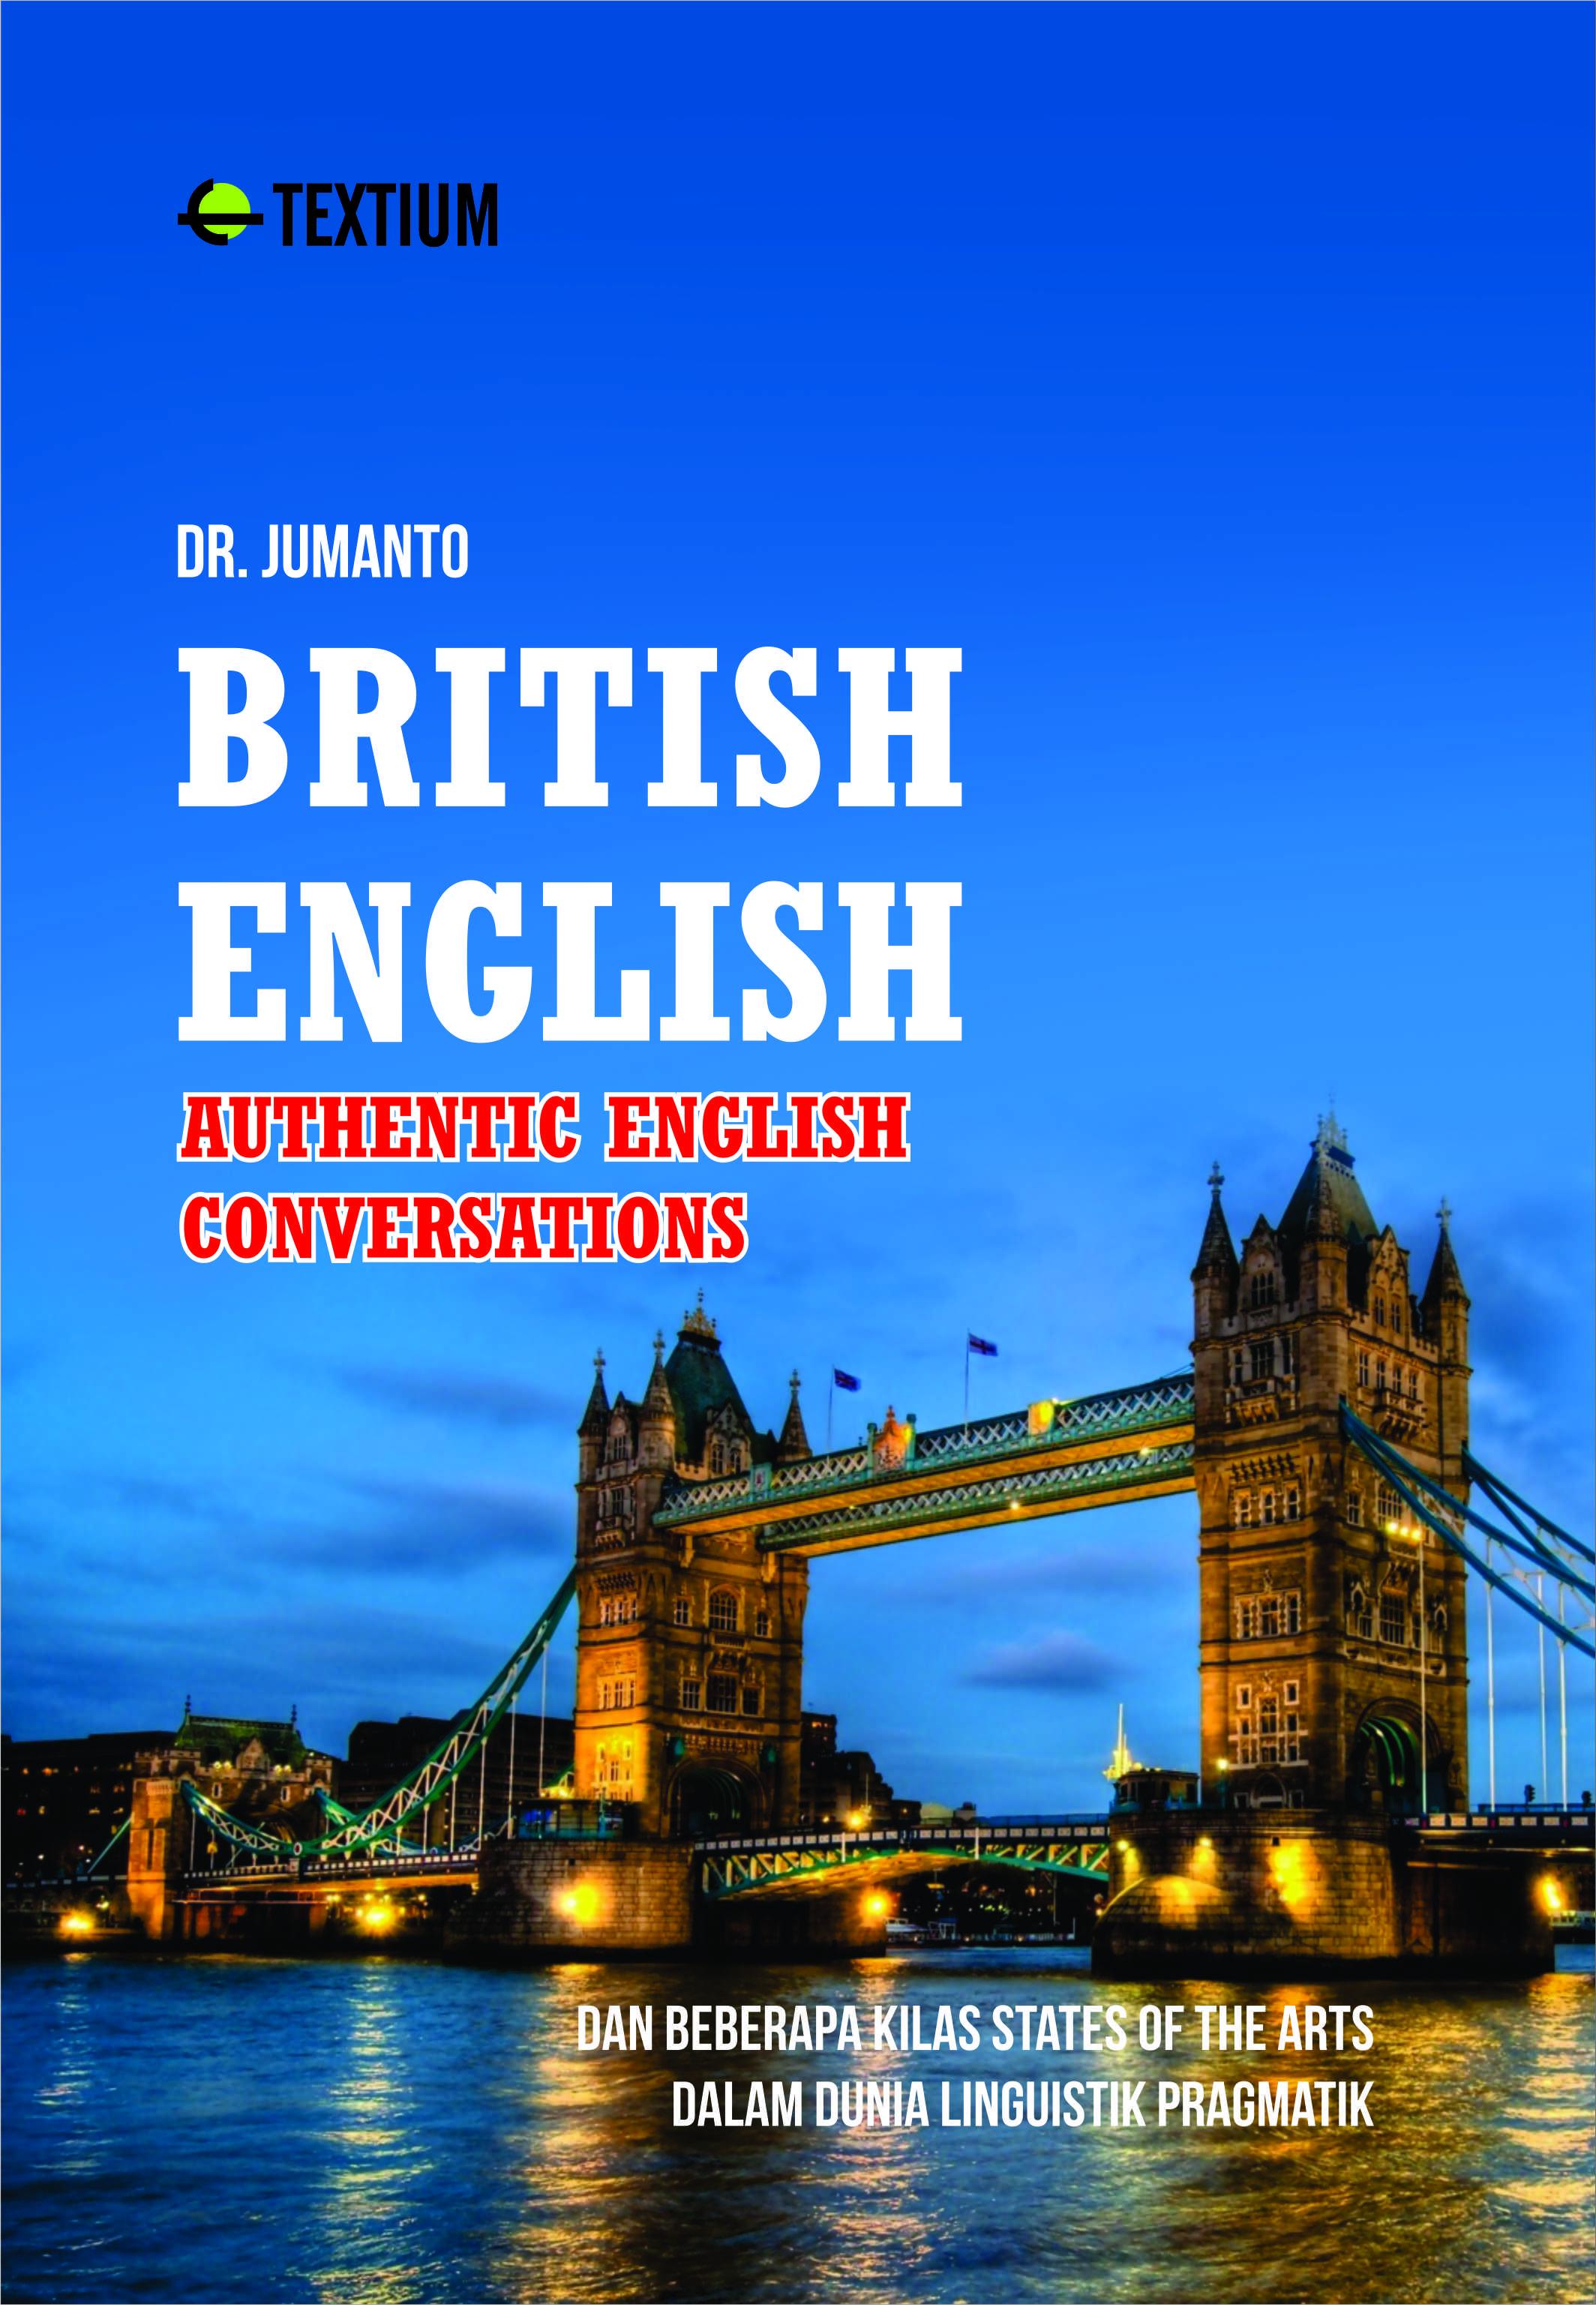 BRITISH ENGLISH; AUTHENTIC ENGLISH CONVERSATIONS dan Beberapa Kilas States of the Arts dalam Dunia Linguistik Pragmatik